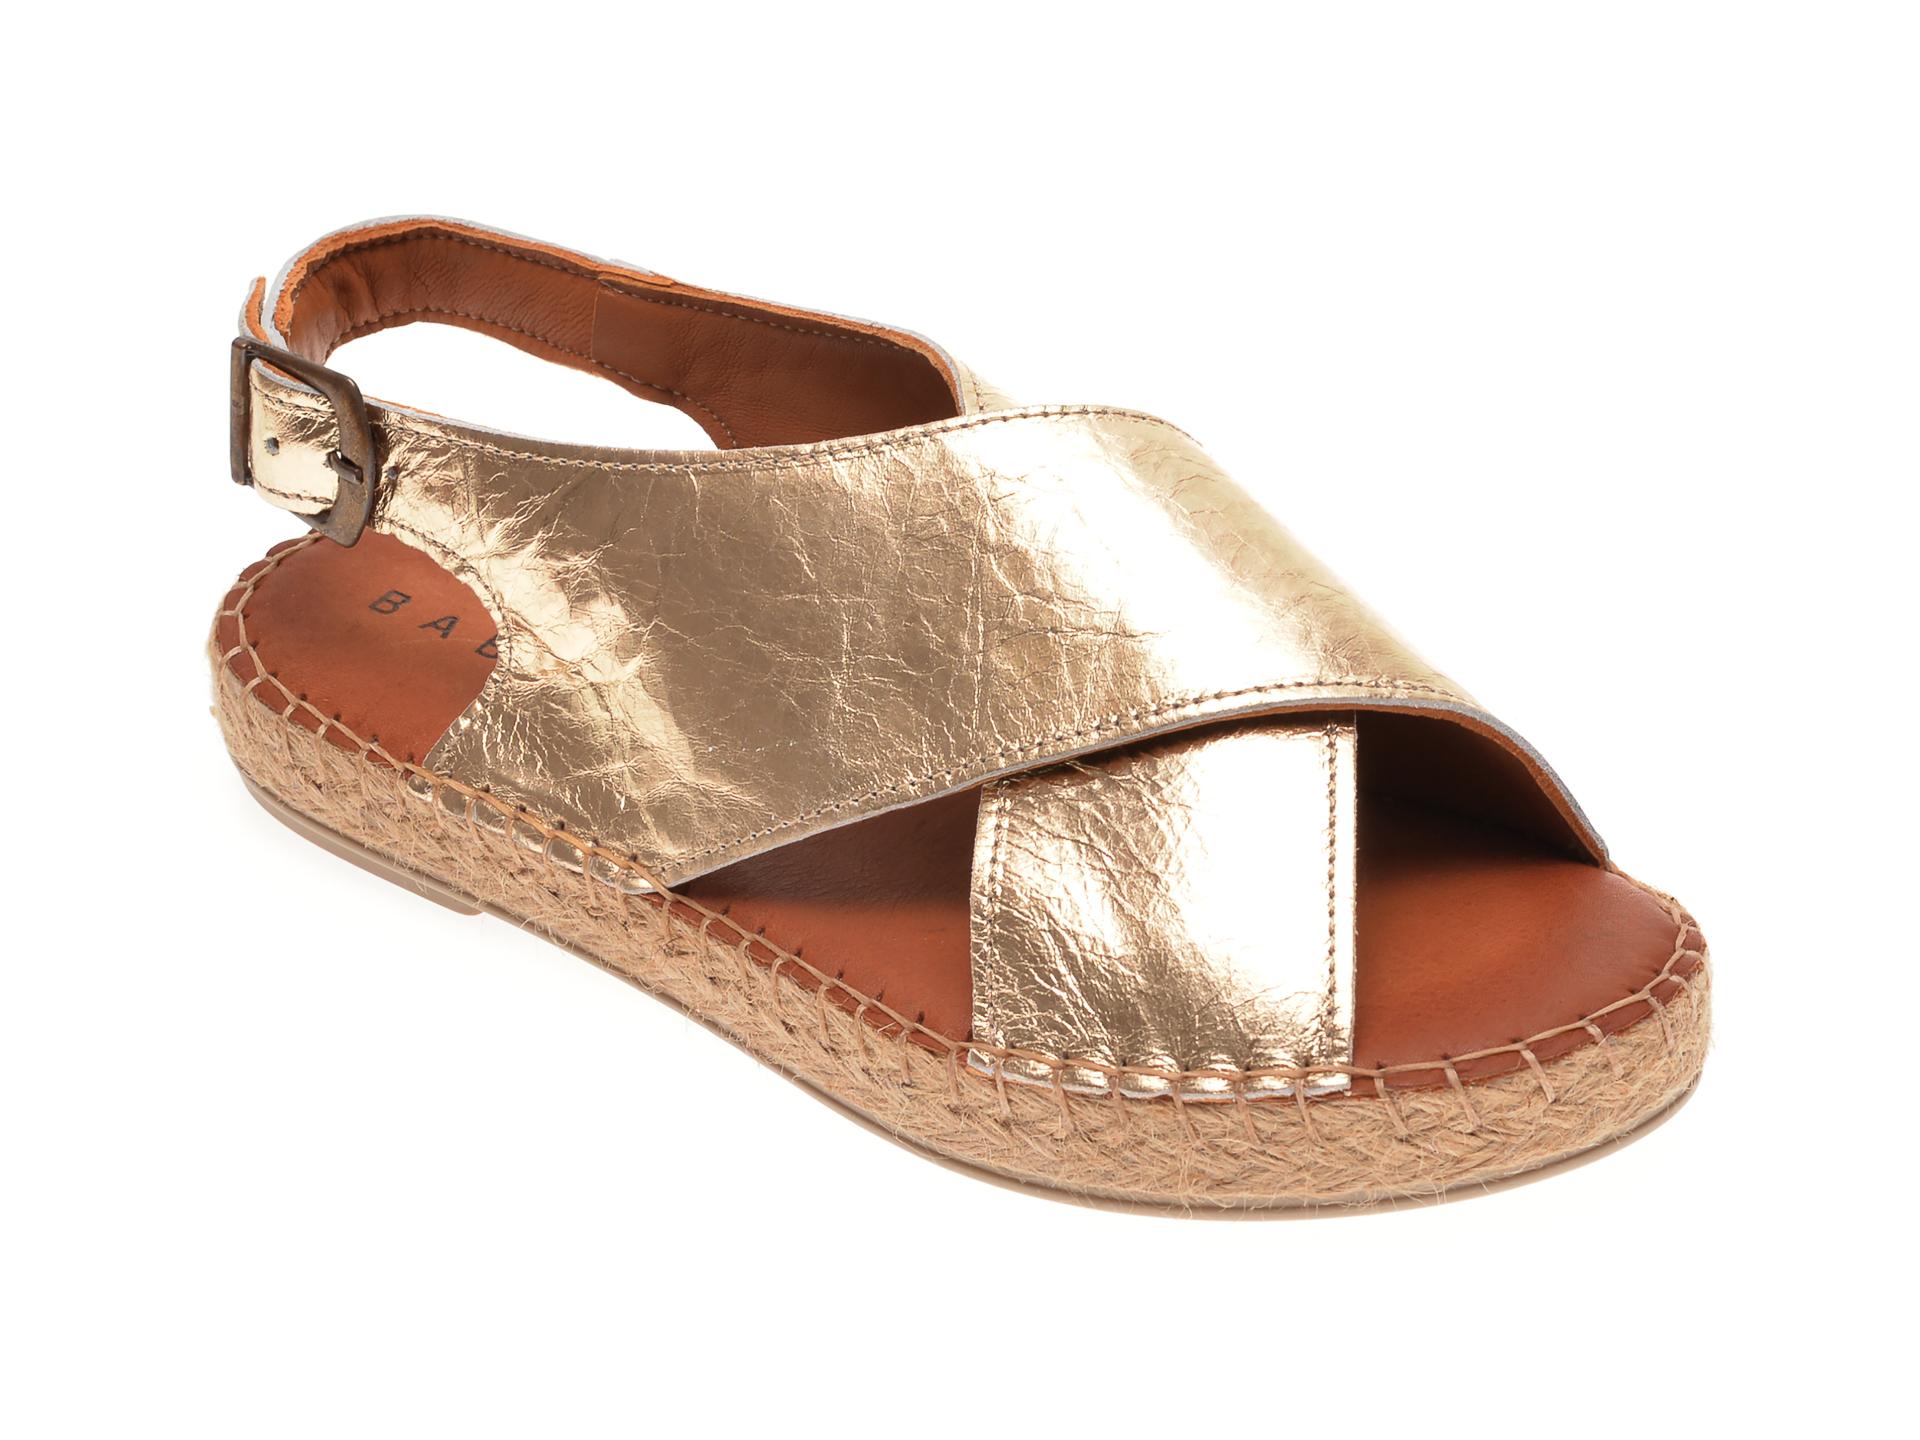 Sandale BABOOS aurii, R05, din piele naturala New